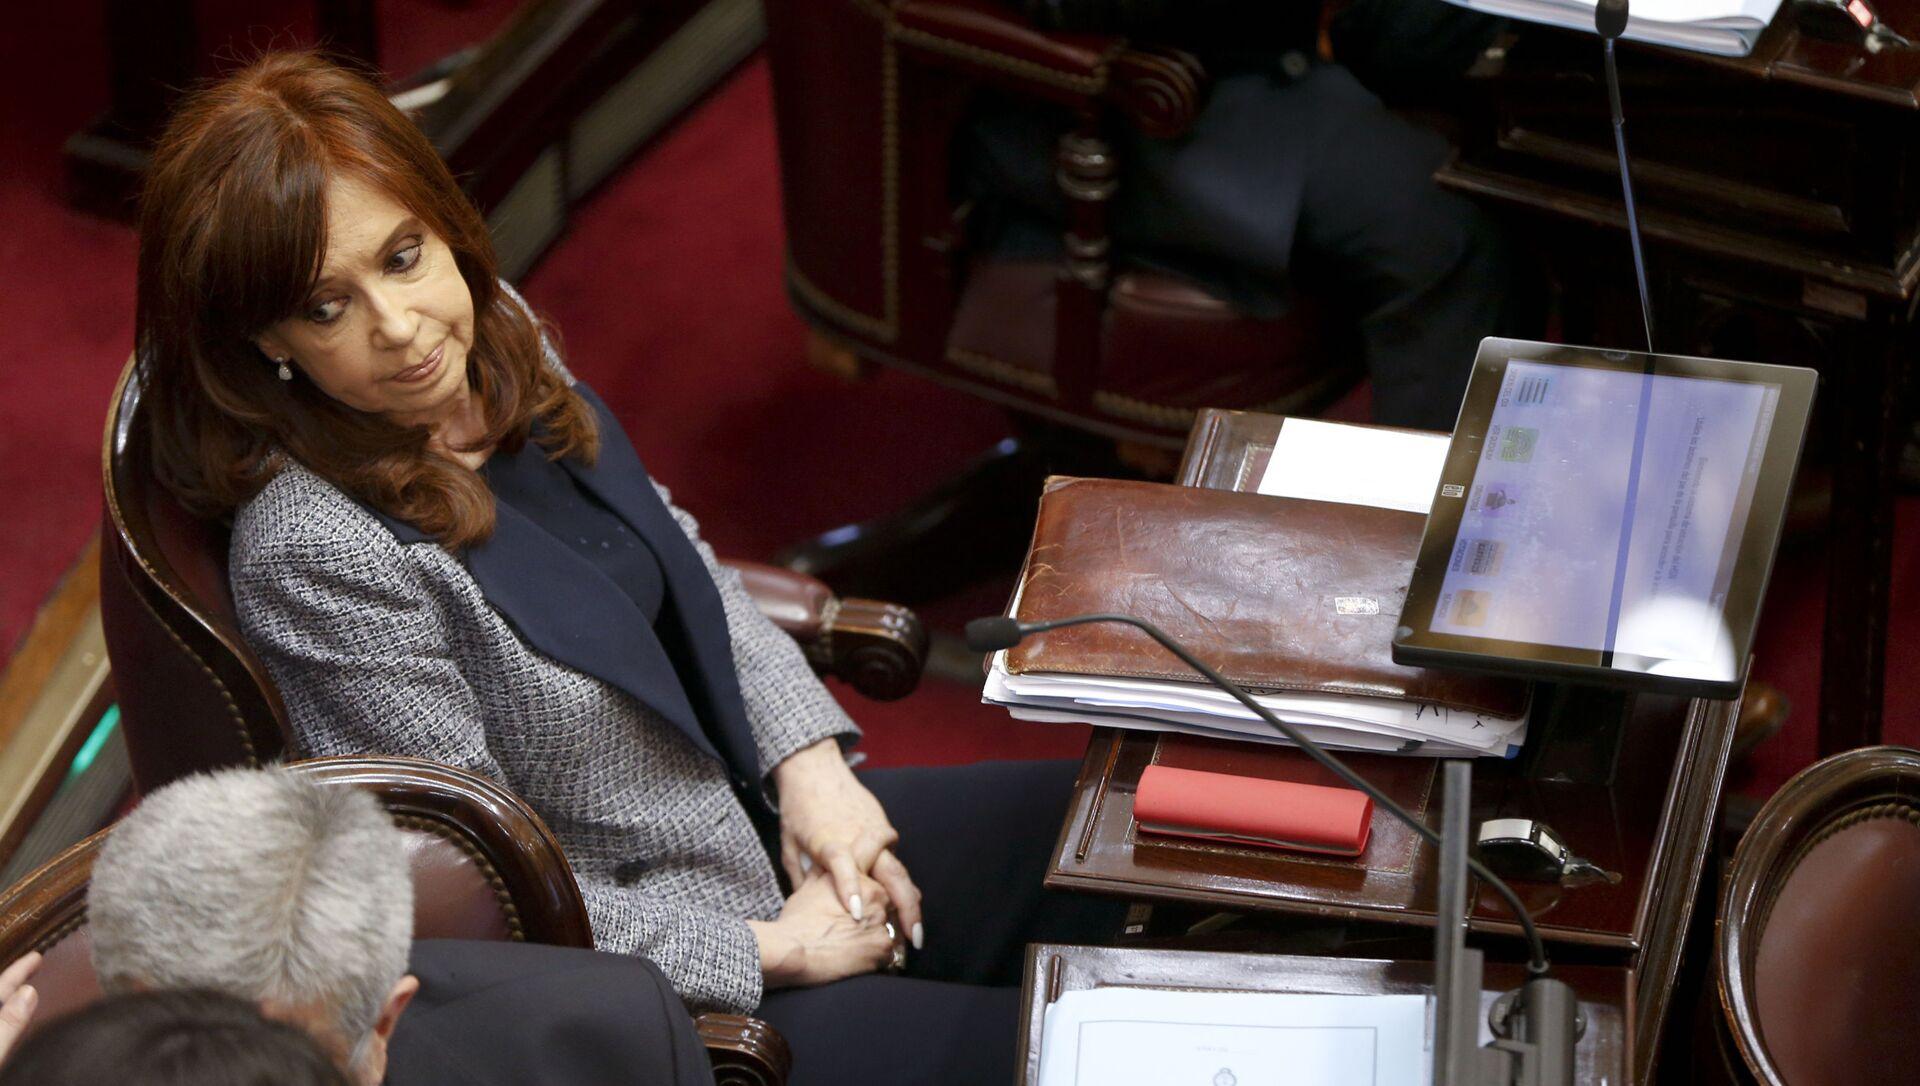 Cristina Fernández de Kirchner en el Senado argentino - Sputnik Mundo, 1920, 14.12.2020